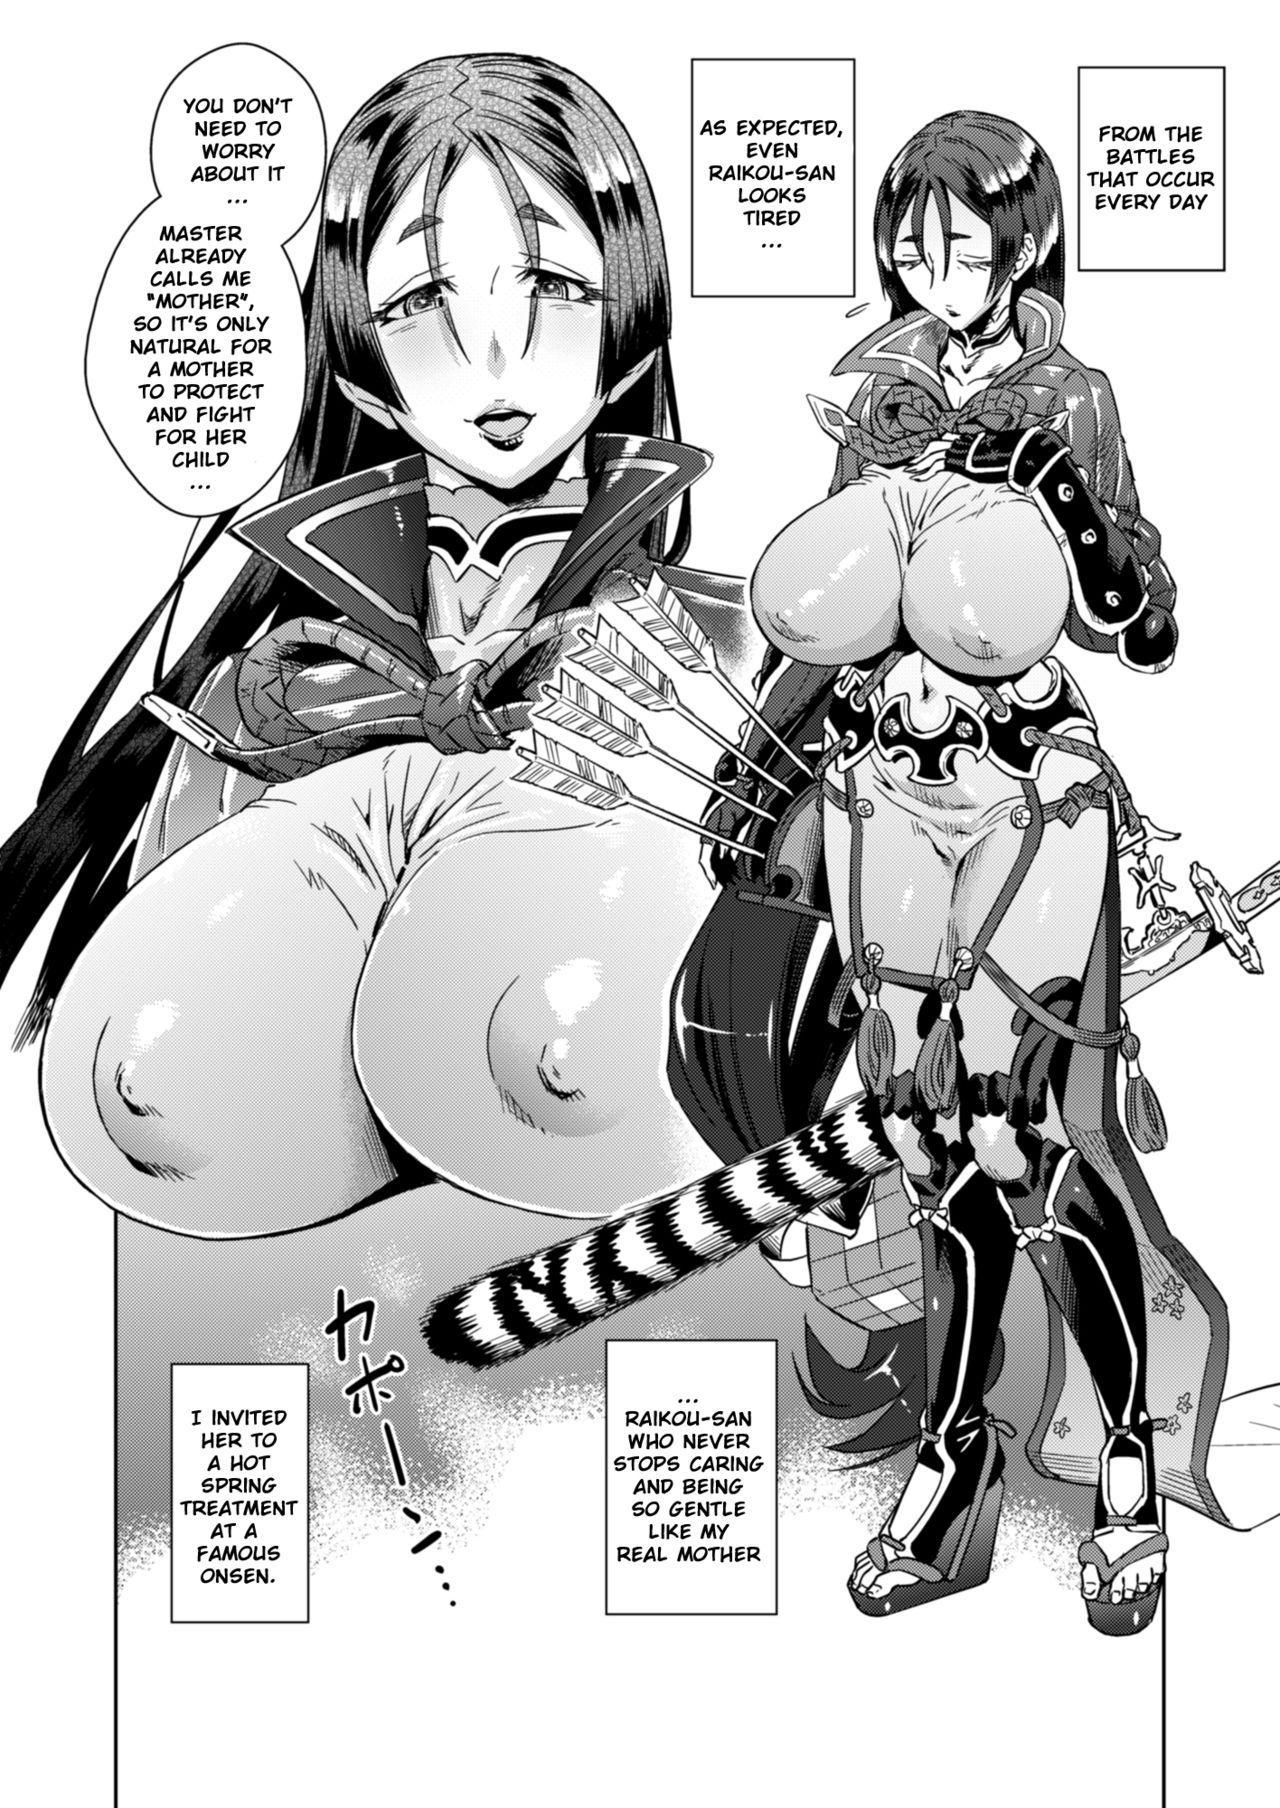 [Homerun Chaya (Abe Morioka)] Raikou (Mama) to Onsen Ecchi | Hot Spring Sex with Mama Raikou (Fate/Grand Order) [English] [Digital] 2